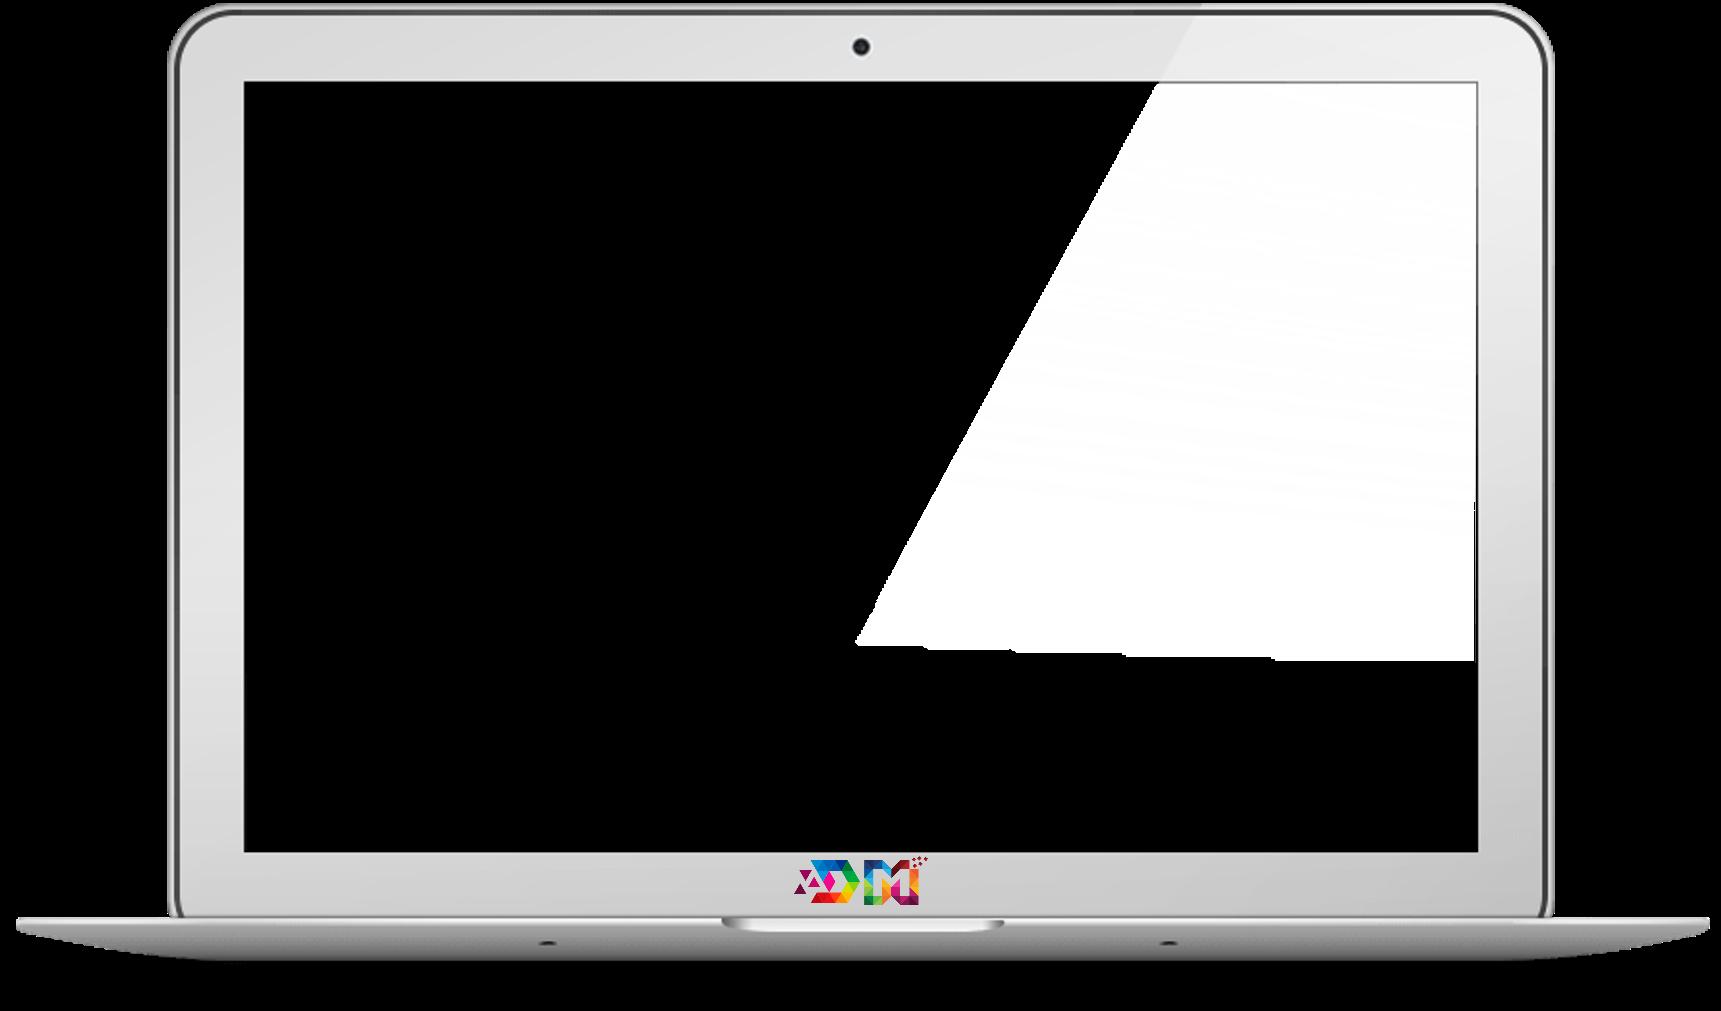 لب تاپ - سوشال مدیا